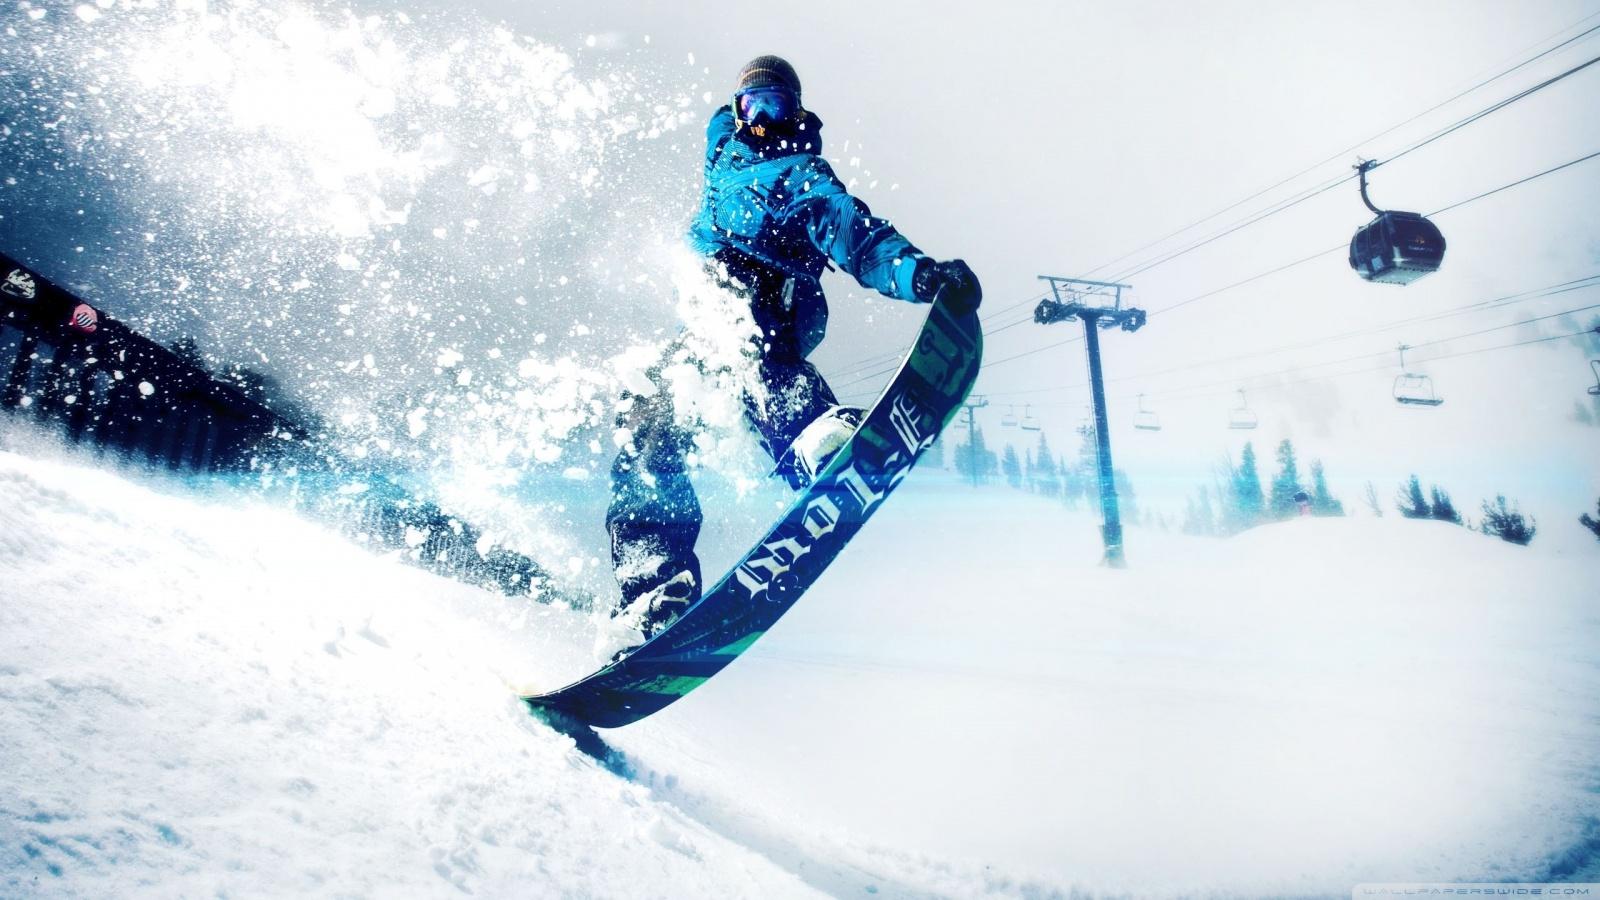 hd_snowboarding-wallpaper-1600x900.jpg